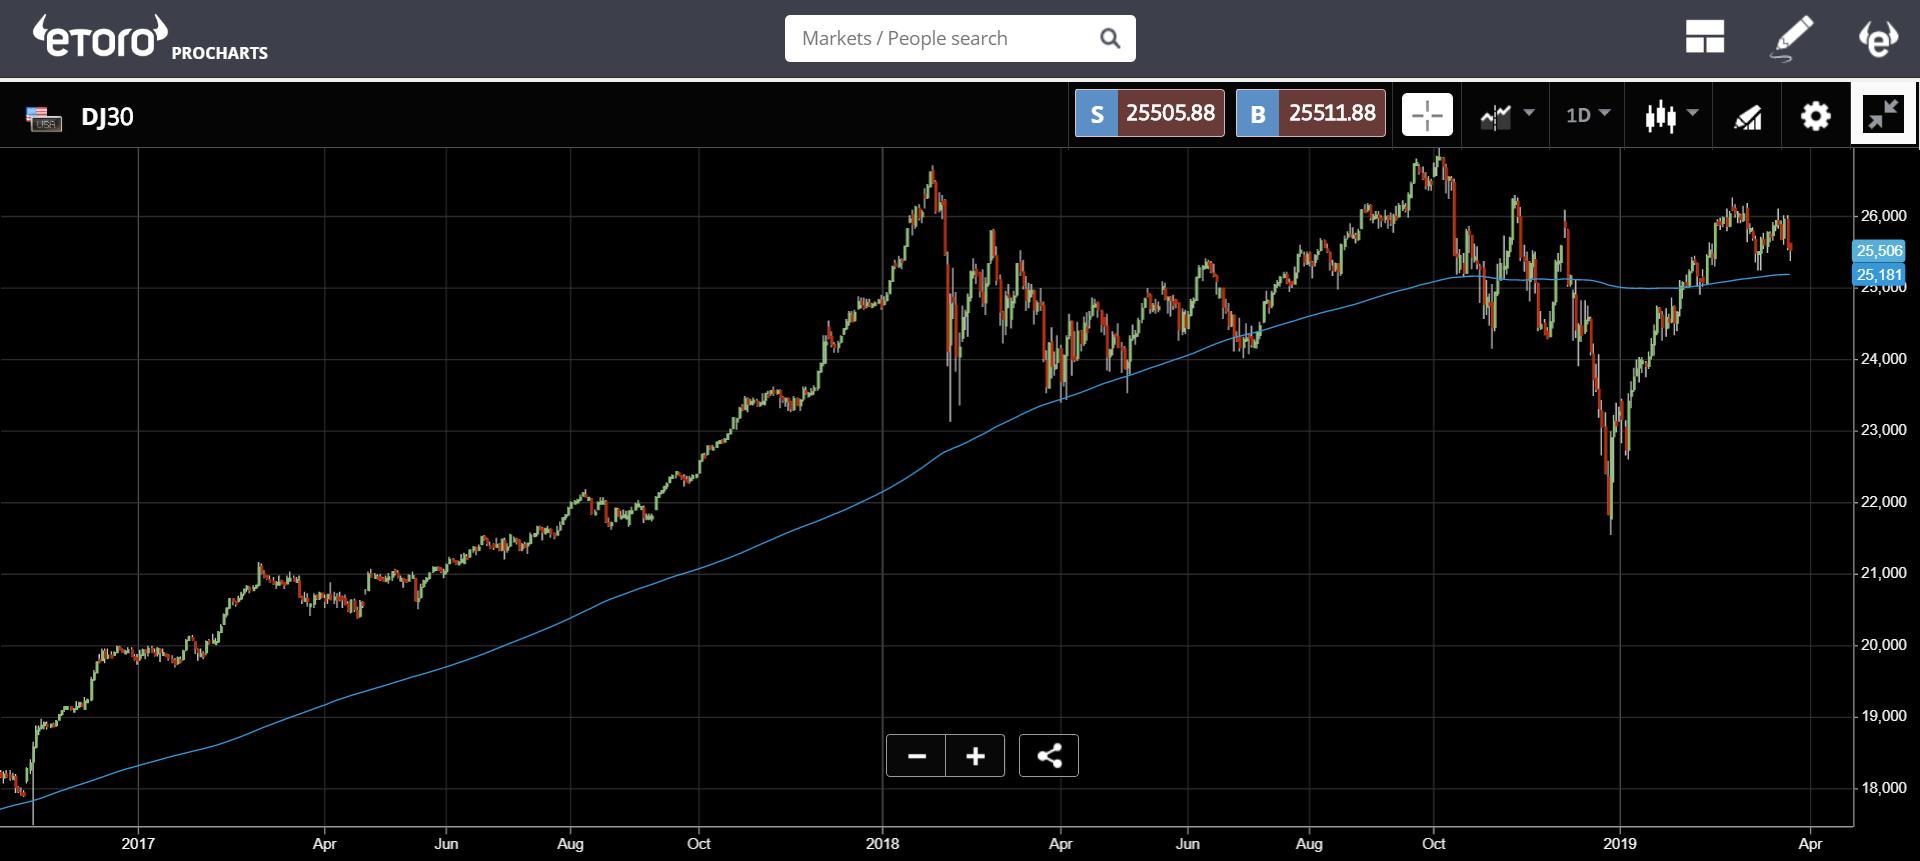 market, cryptocurrency, trading, bitcoin, ethereum, blockchain, tron